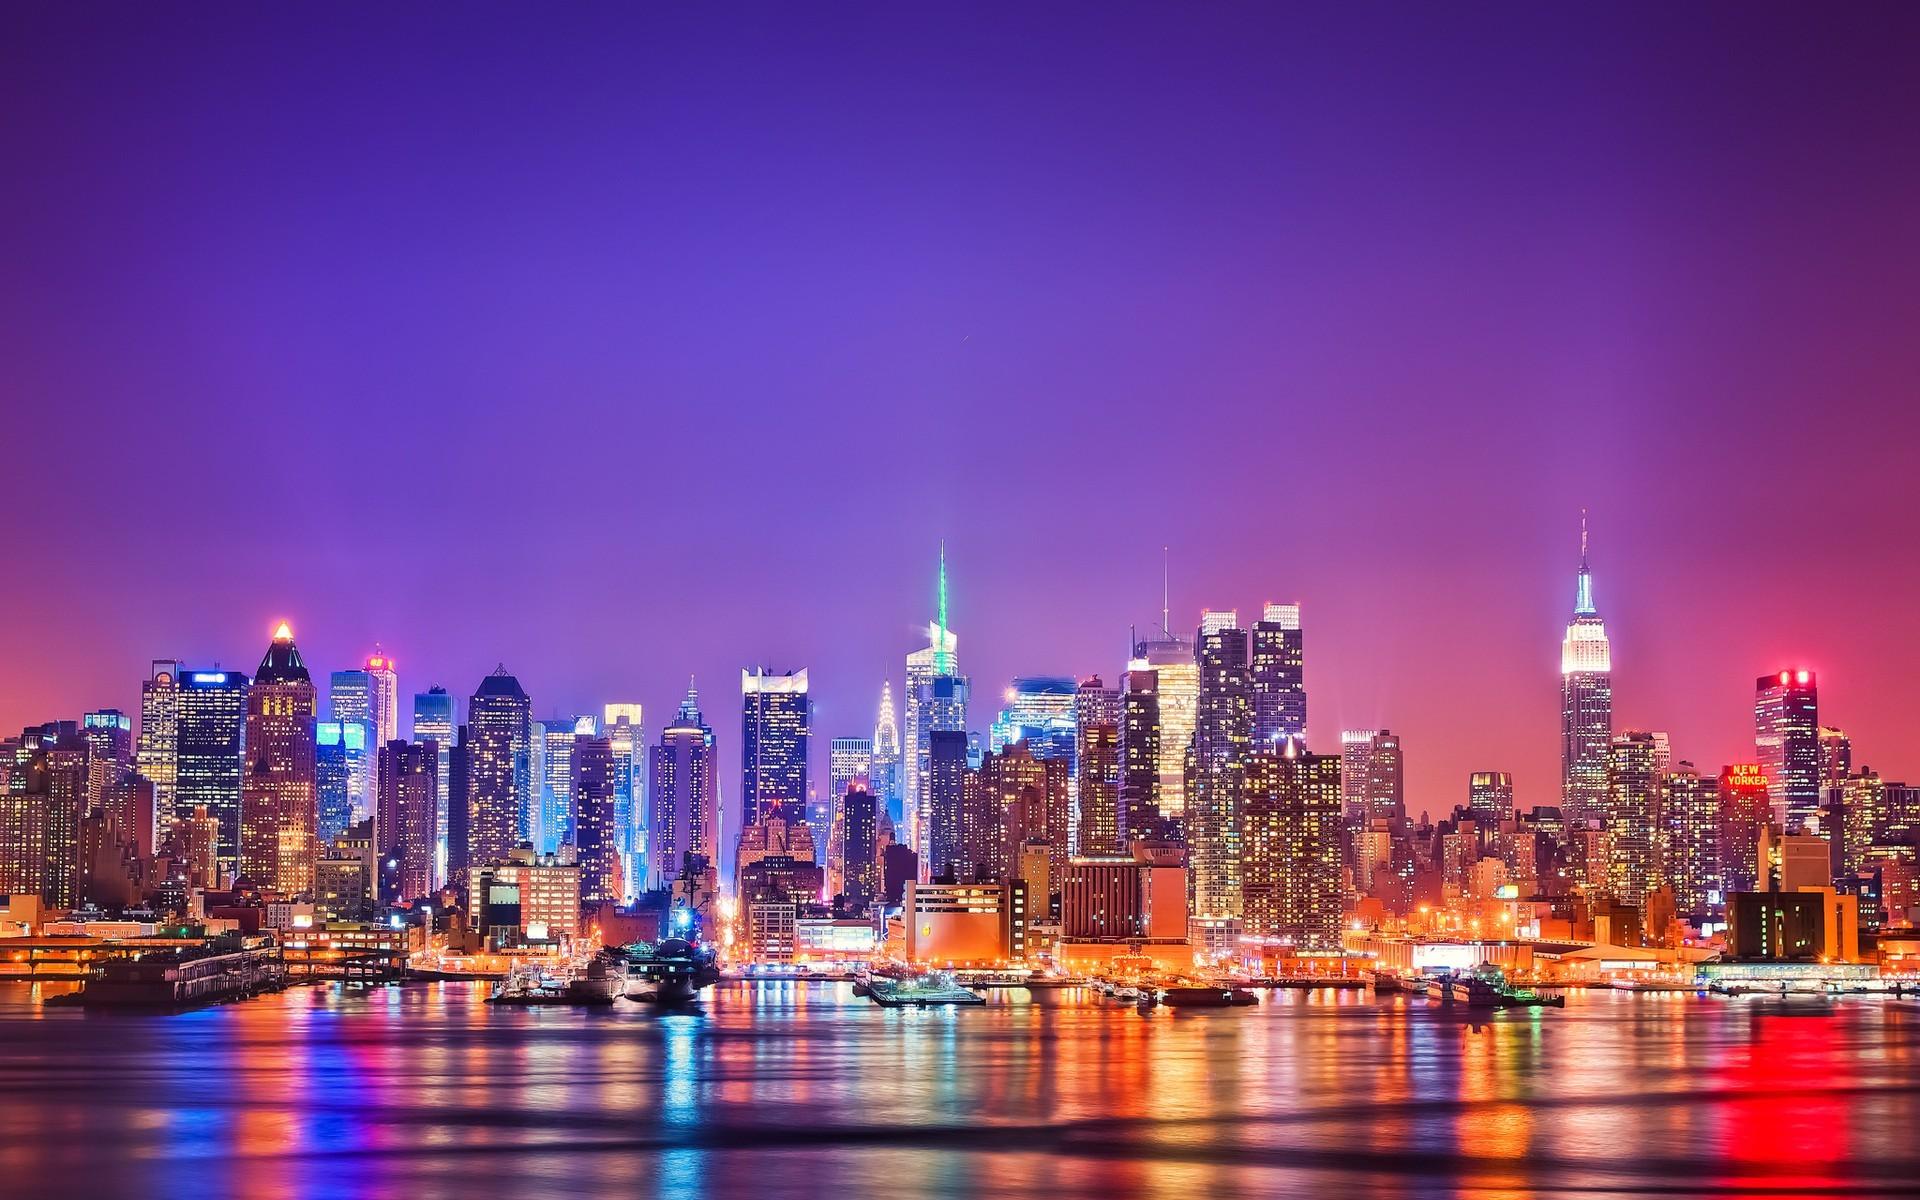 2048x1152 New York City Night Wallpaper